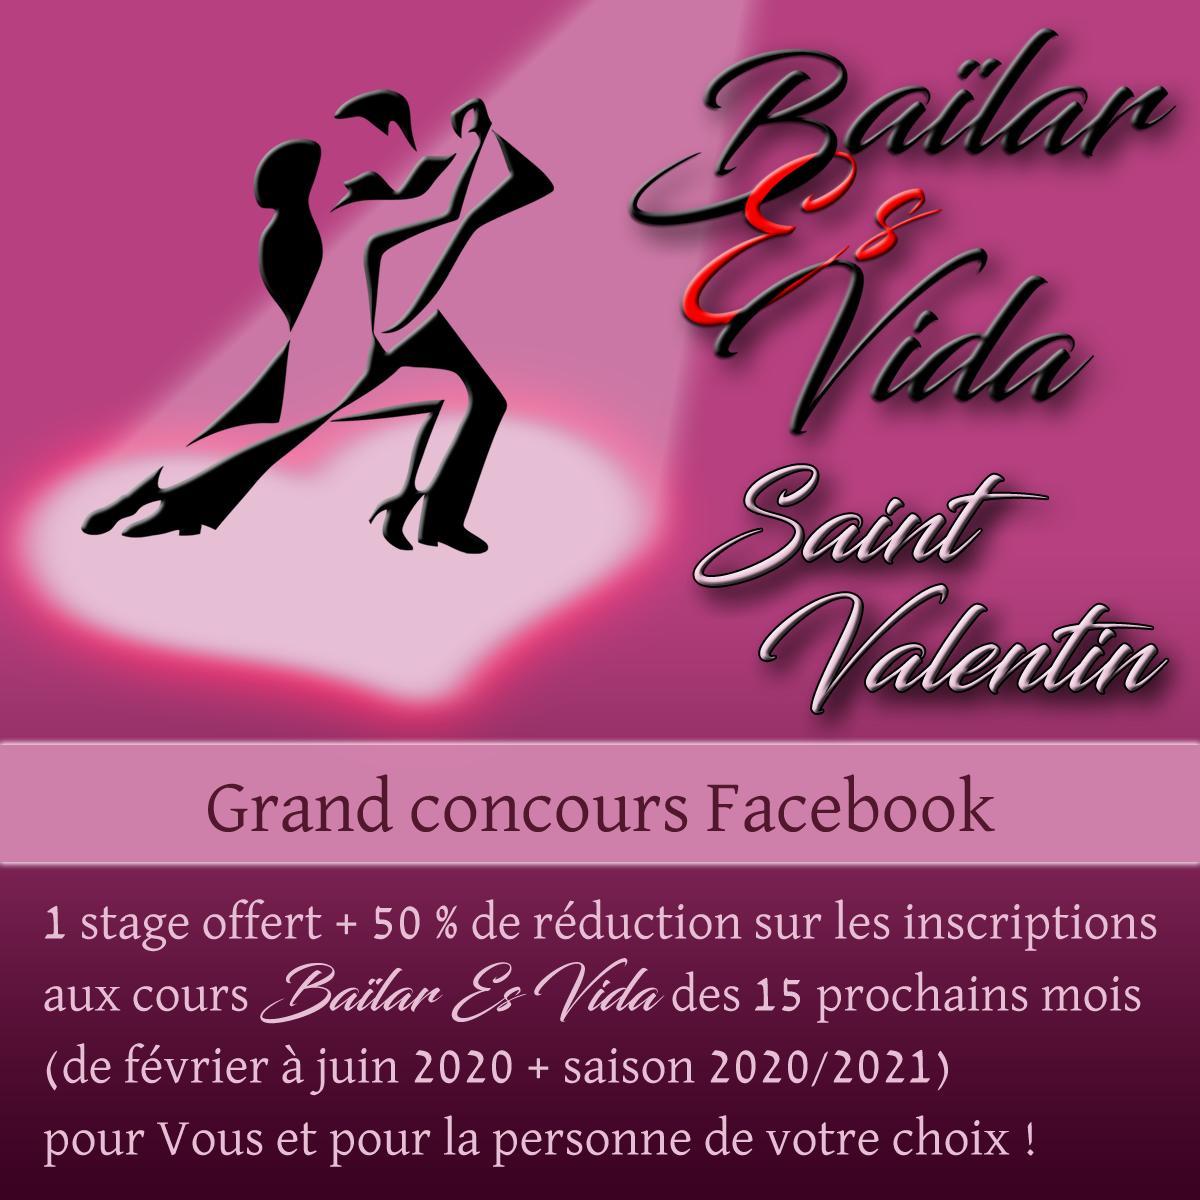 Concours Facebook Saint Valentin